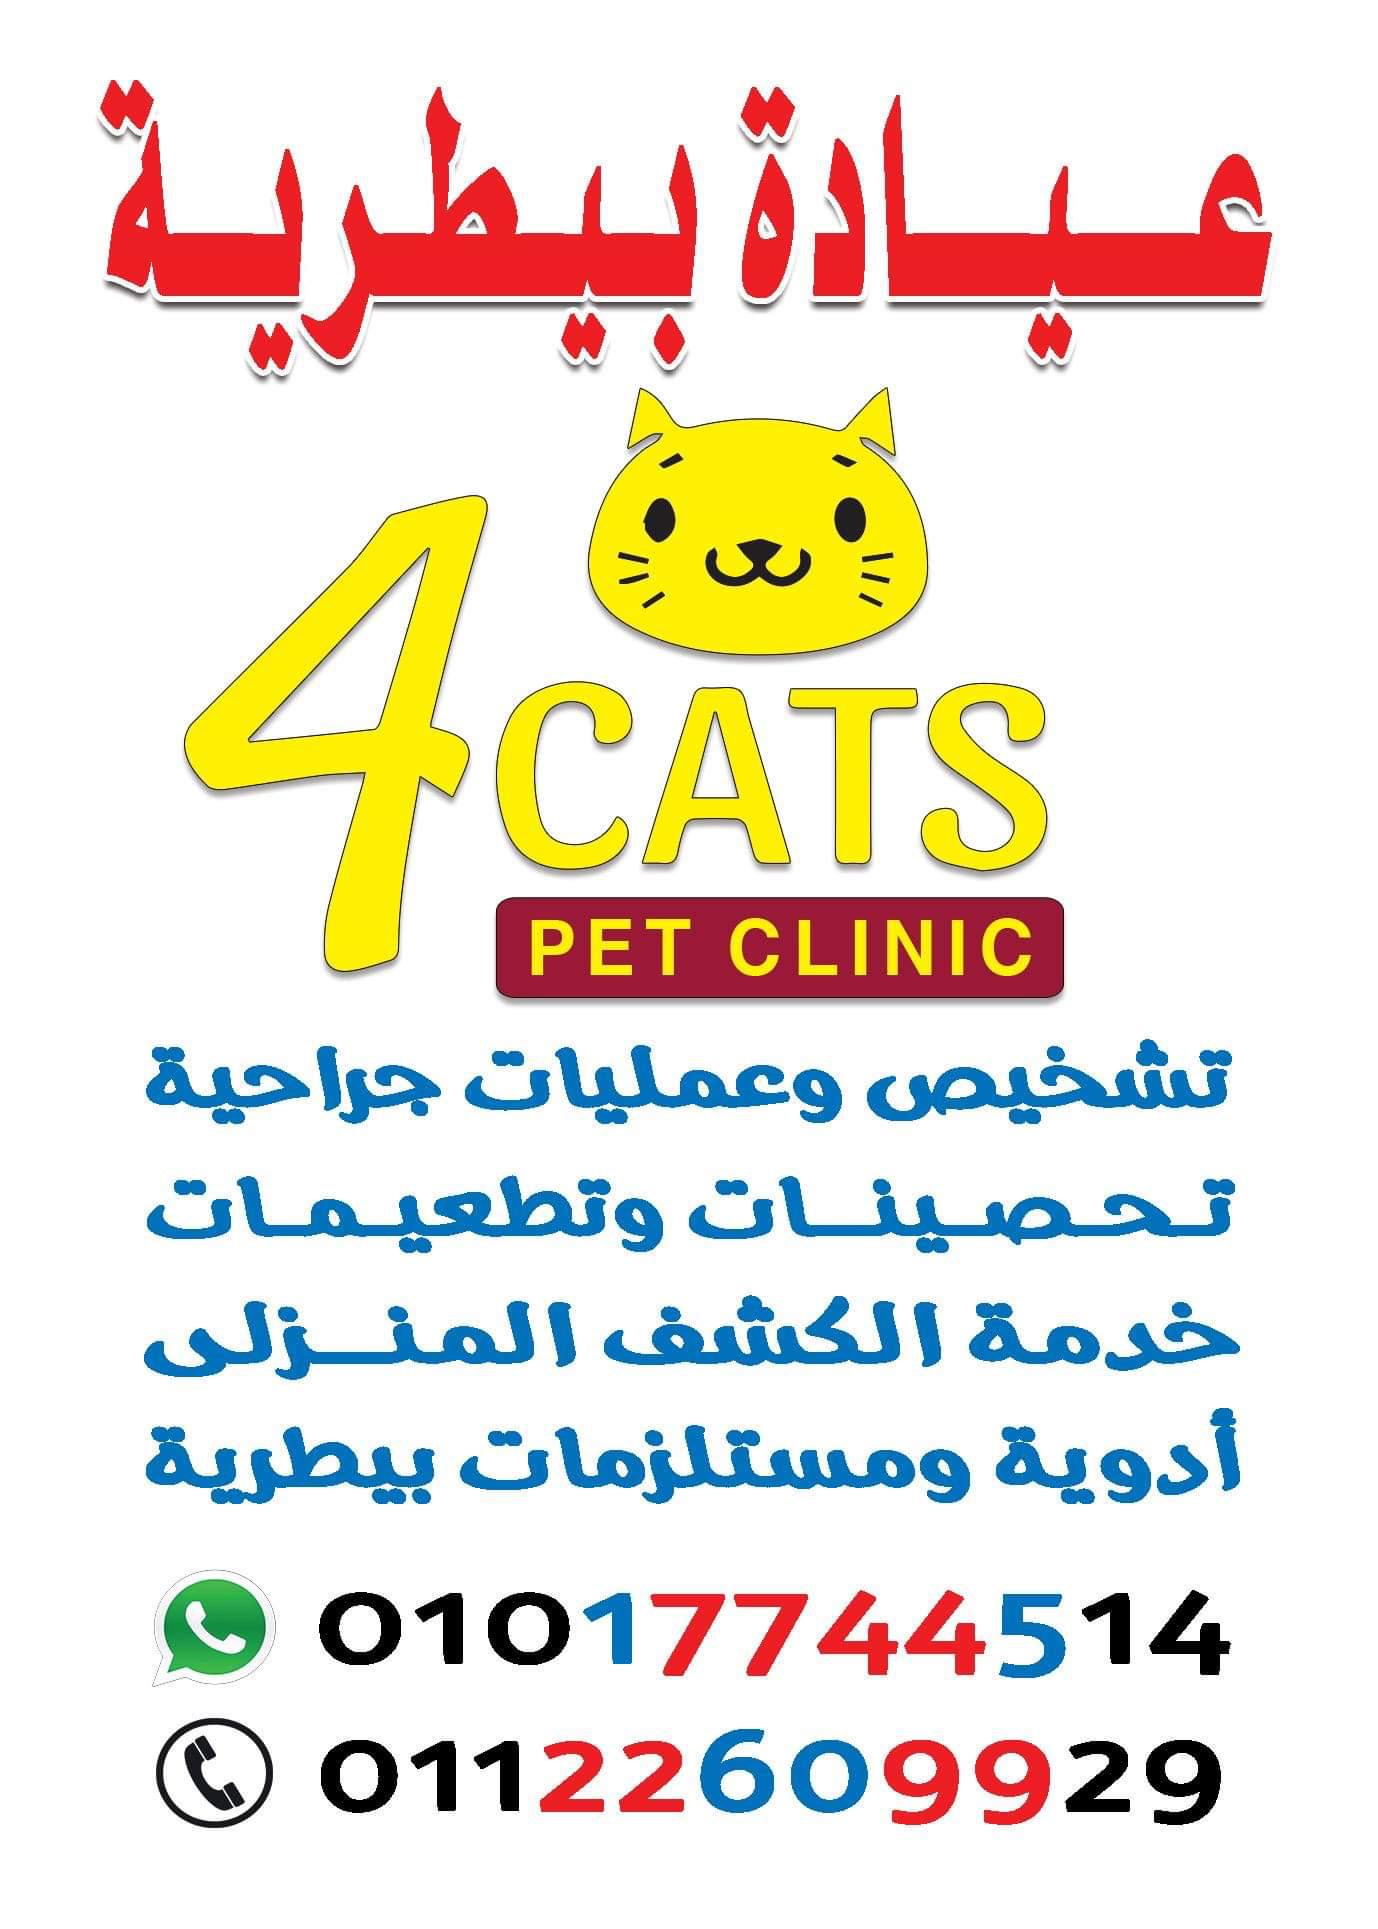 4cats pet clinic